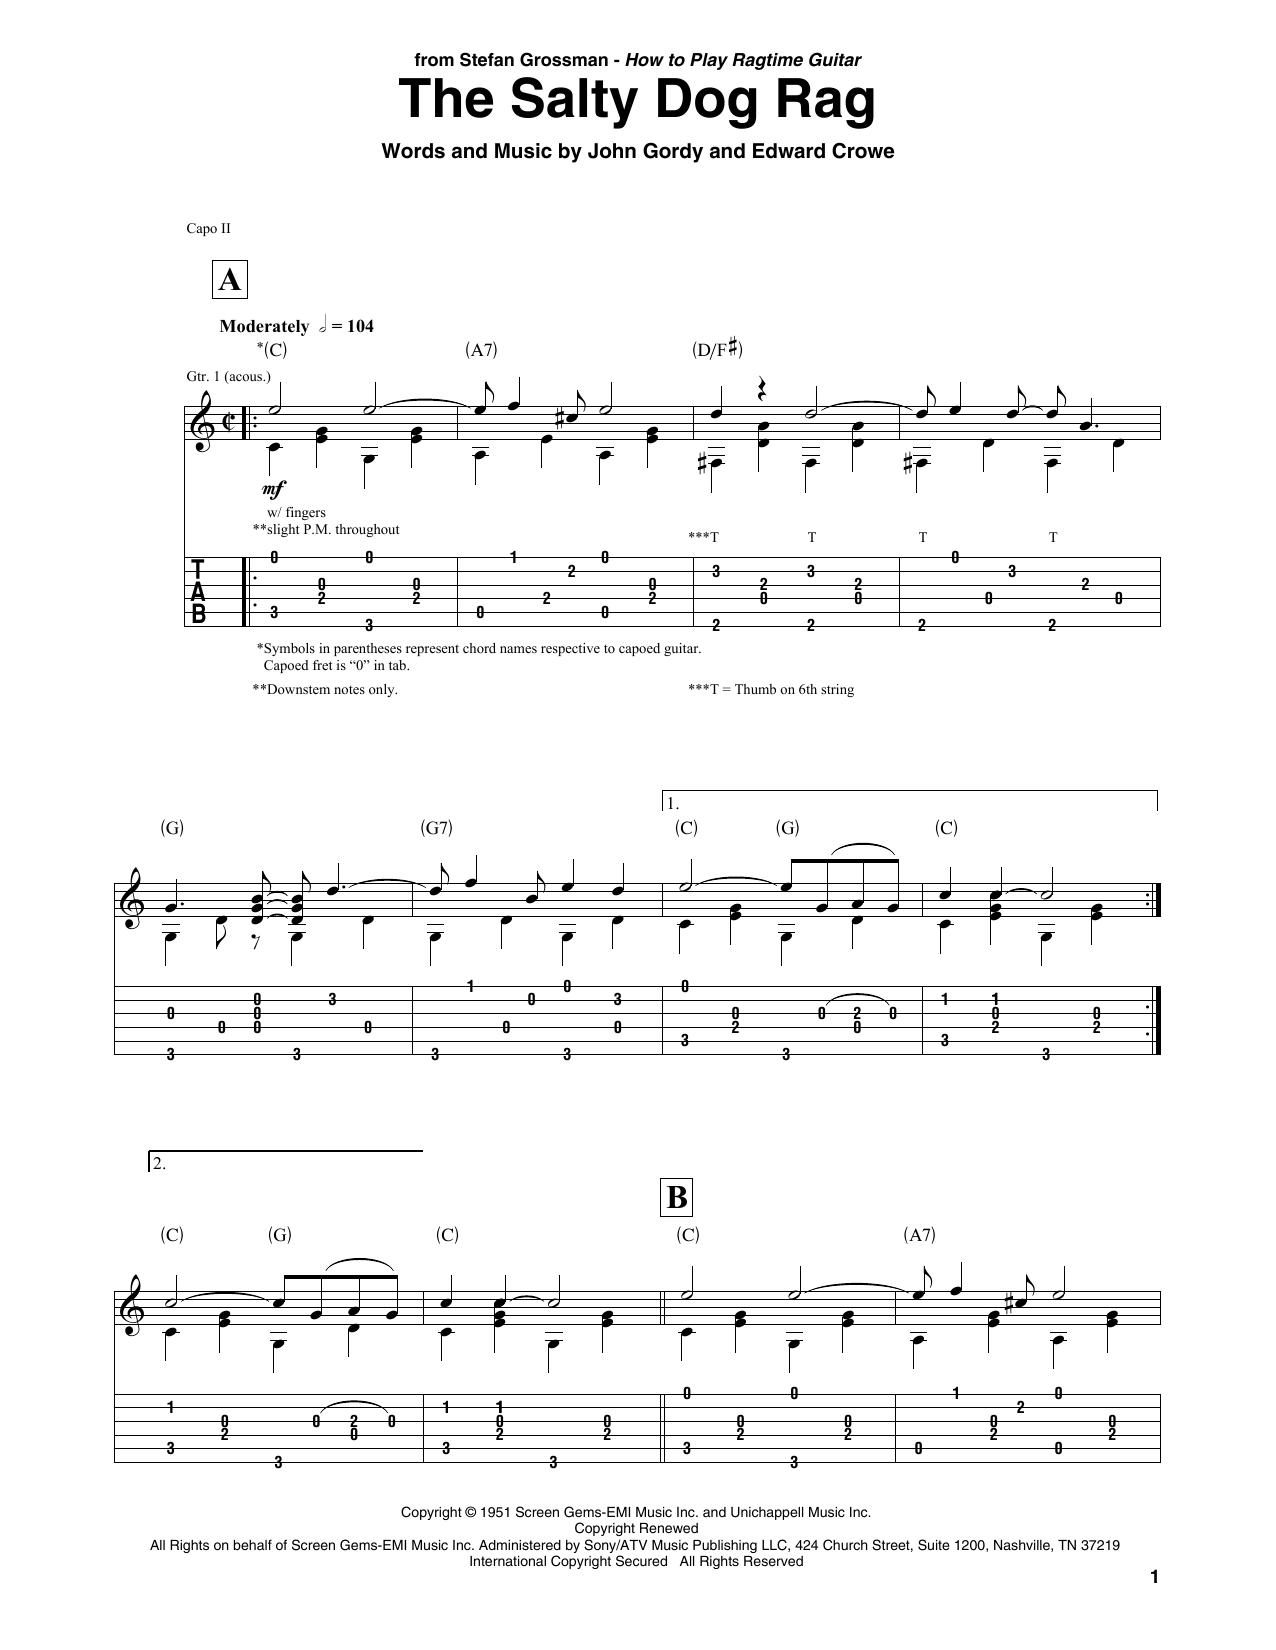 The Salty Dog Rag (Solo Guitar Tab)